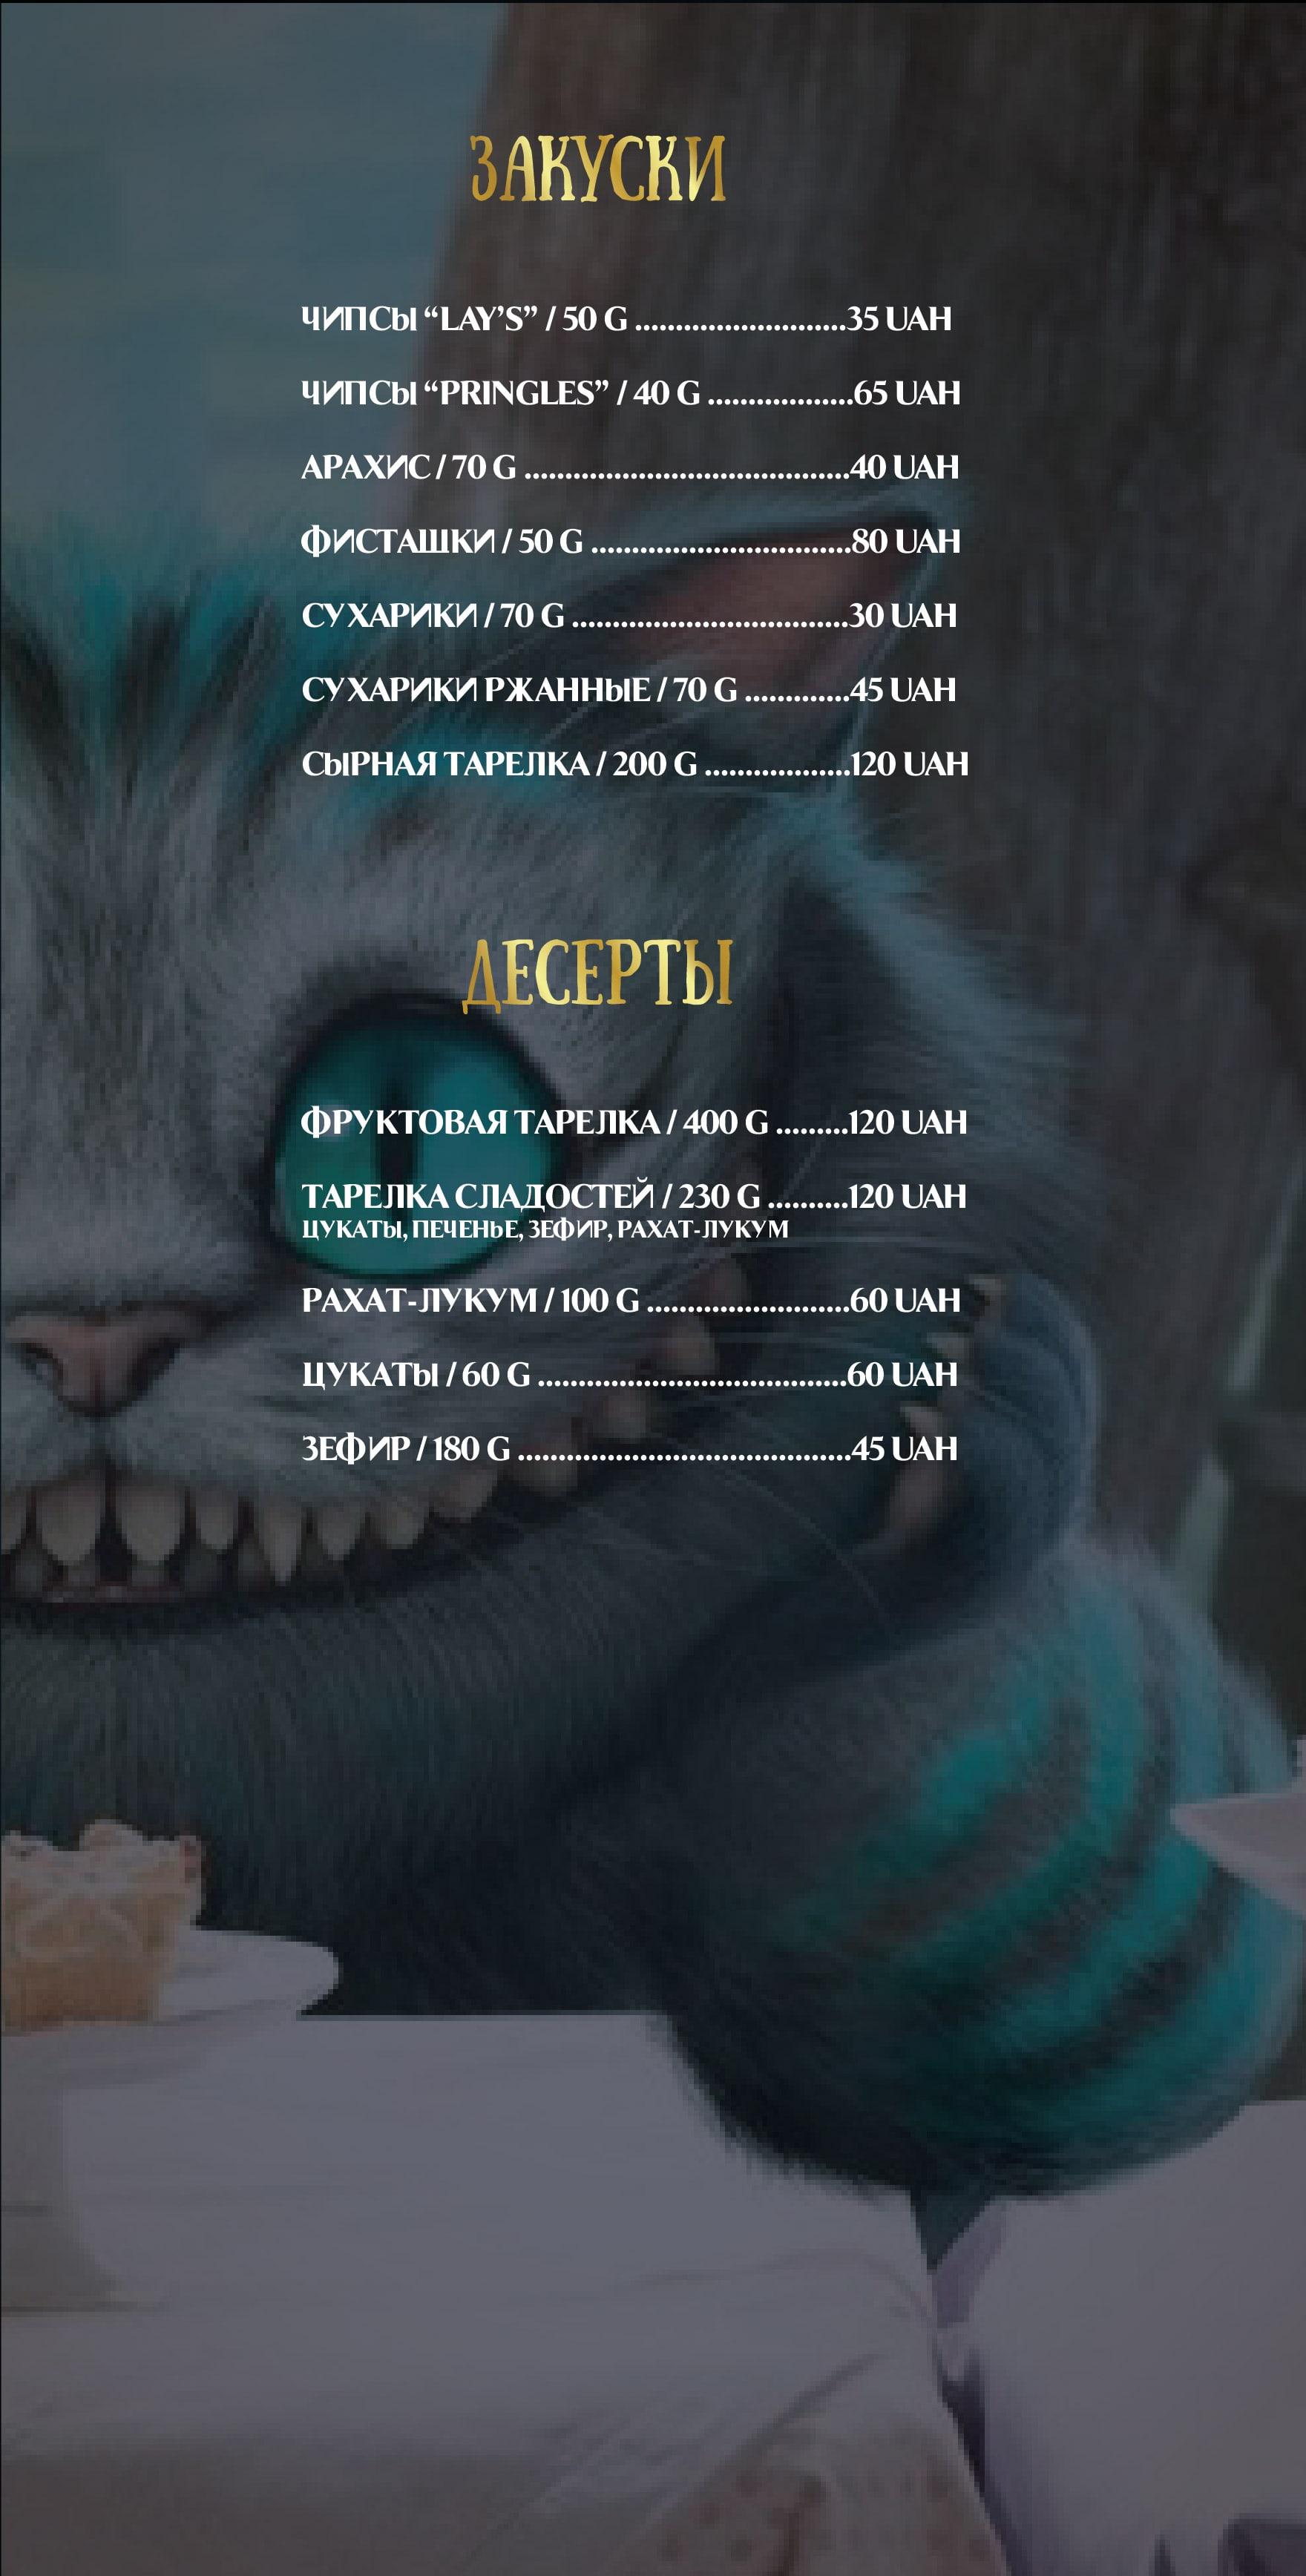 order design for a restaurant bar , design valentine banner, smokeland, order website, order visit card, order logo design, artkatana, Kateryna Fedorova